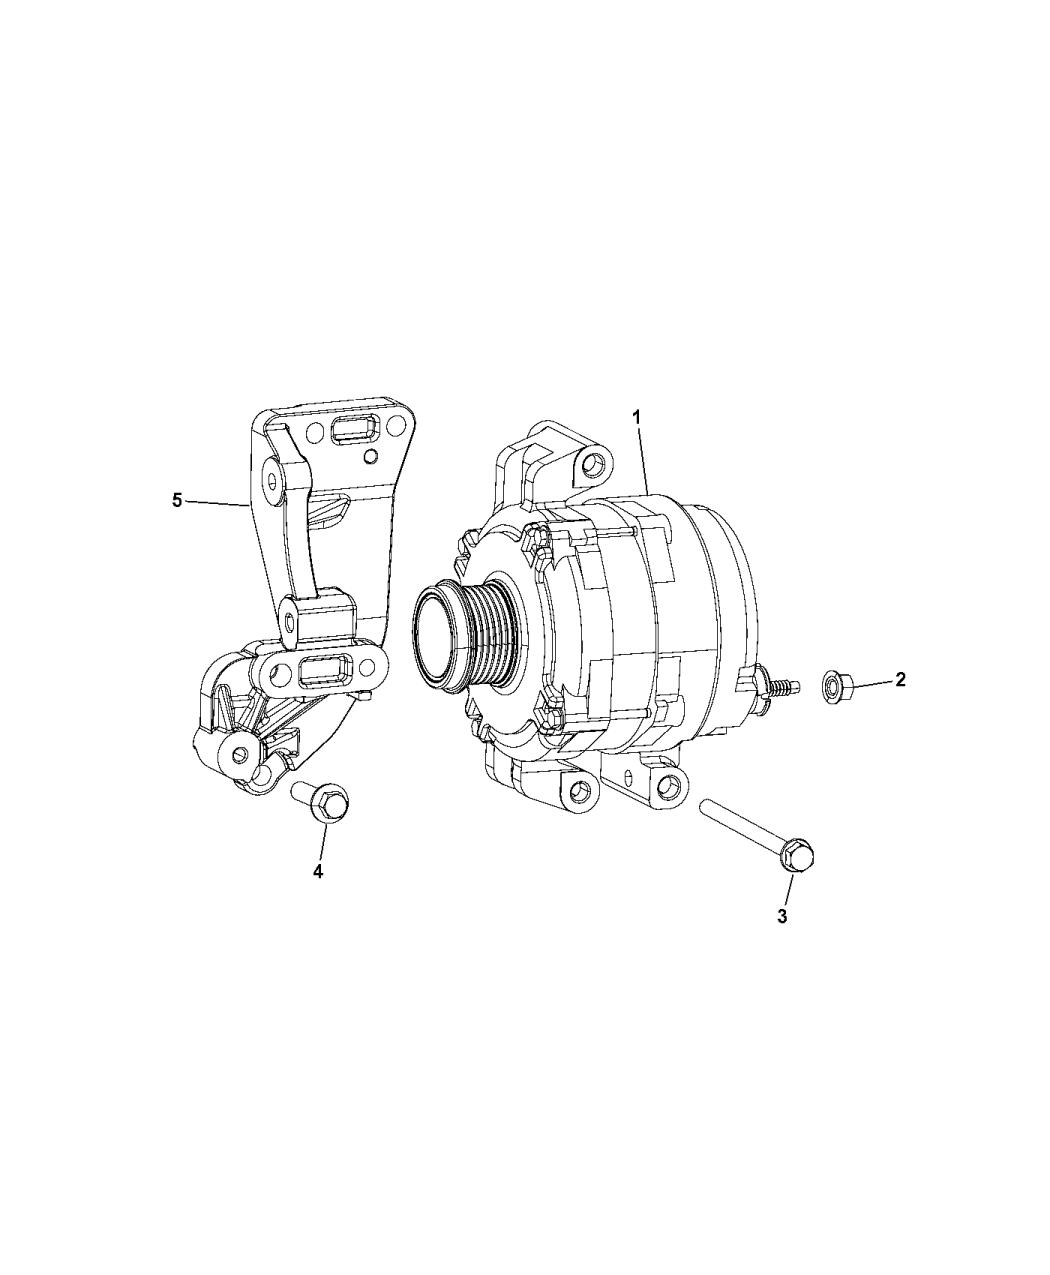 2015 Ram ProMaster City Generator/Alternator - Mopar Parts Giant